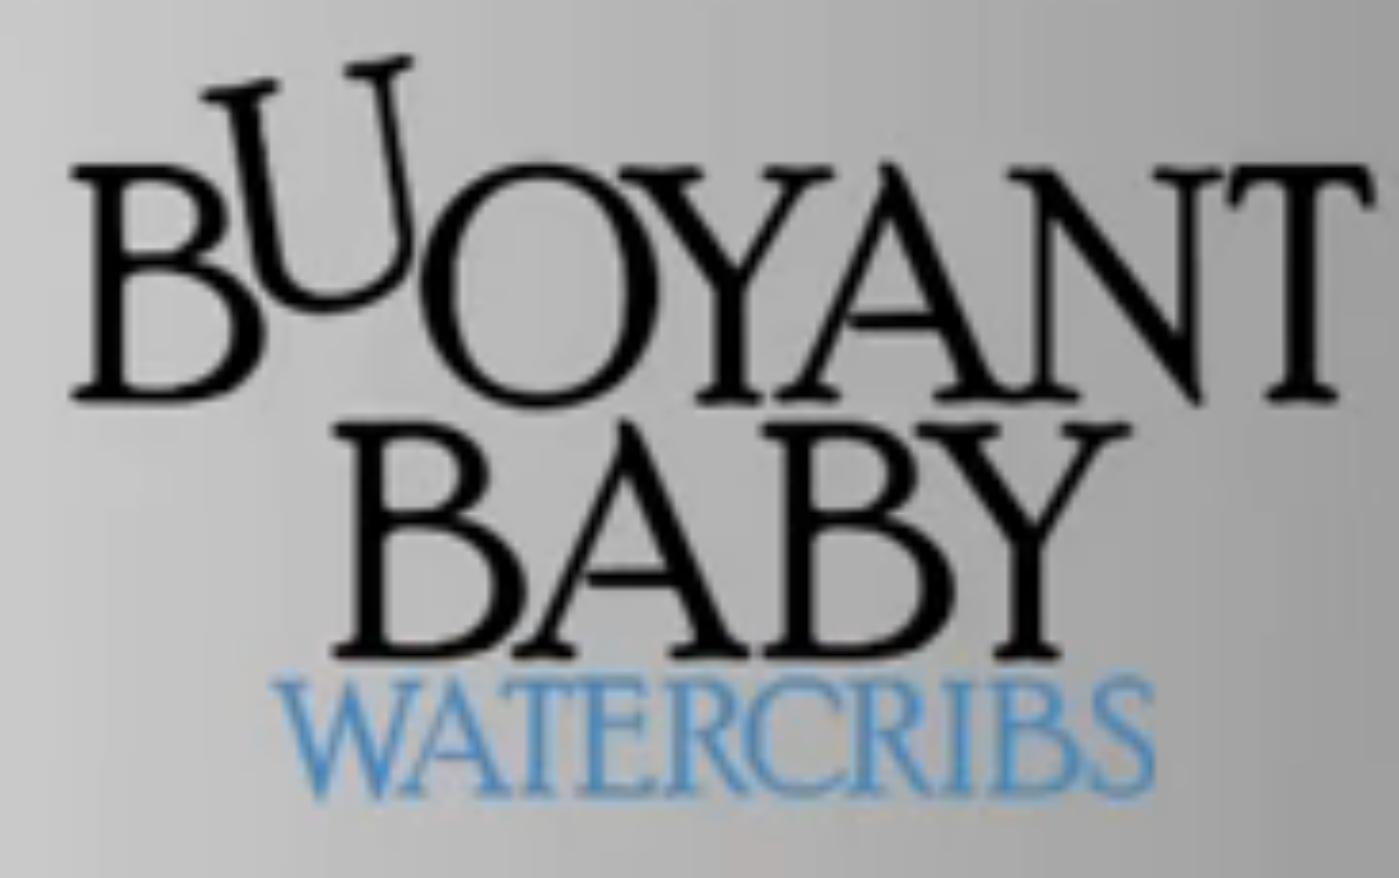 Buoyant Baby Watercribs